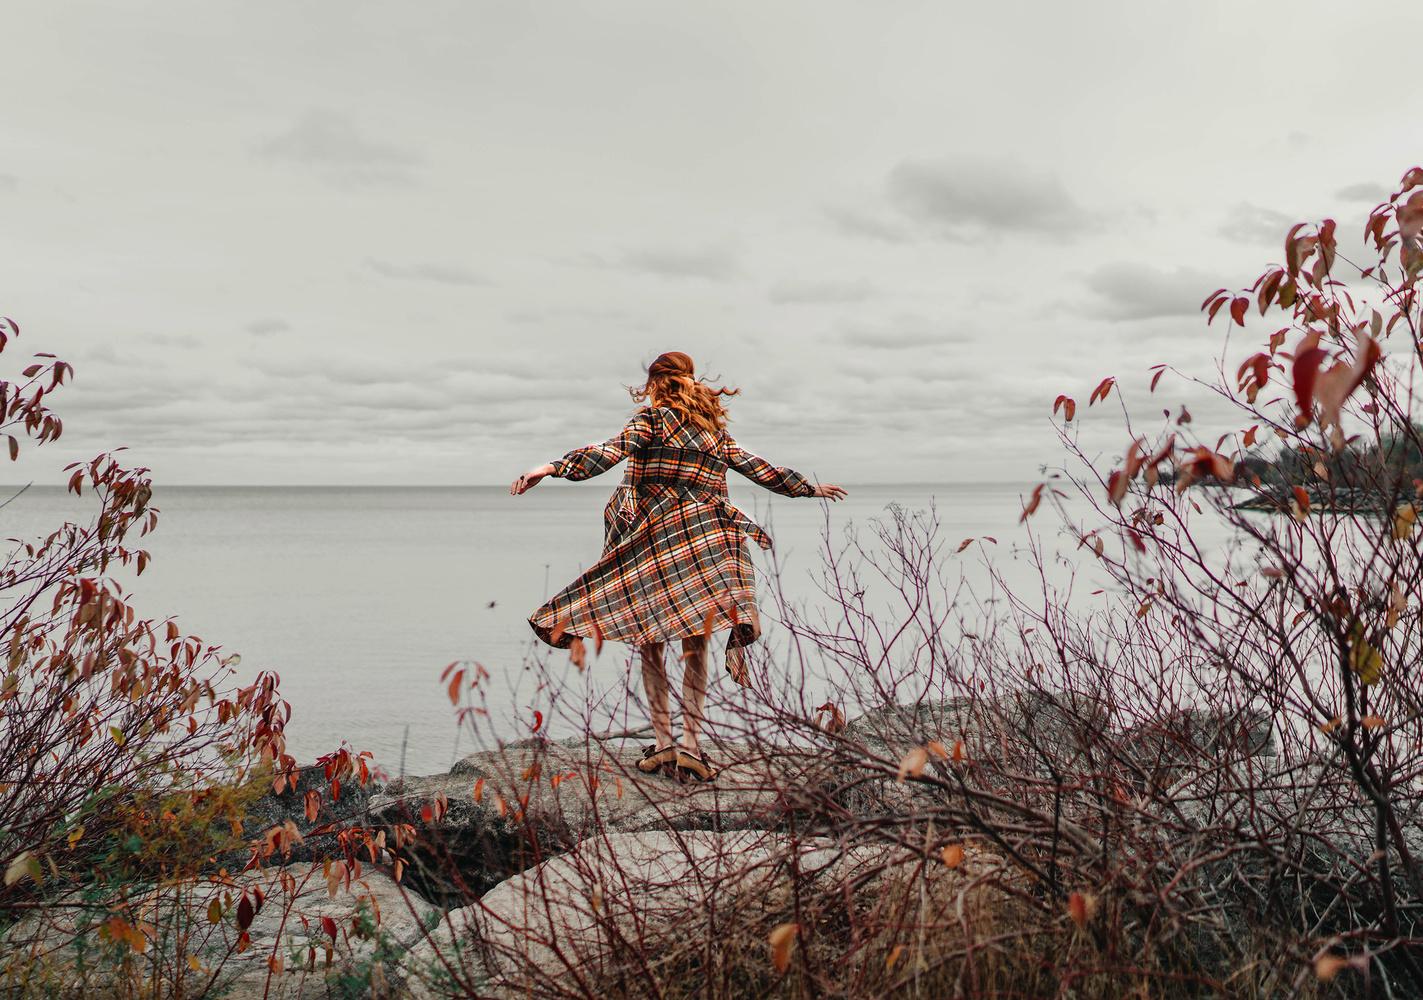 shoreline by Ian Pettigrew